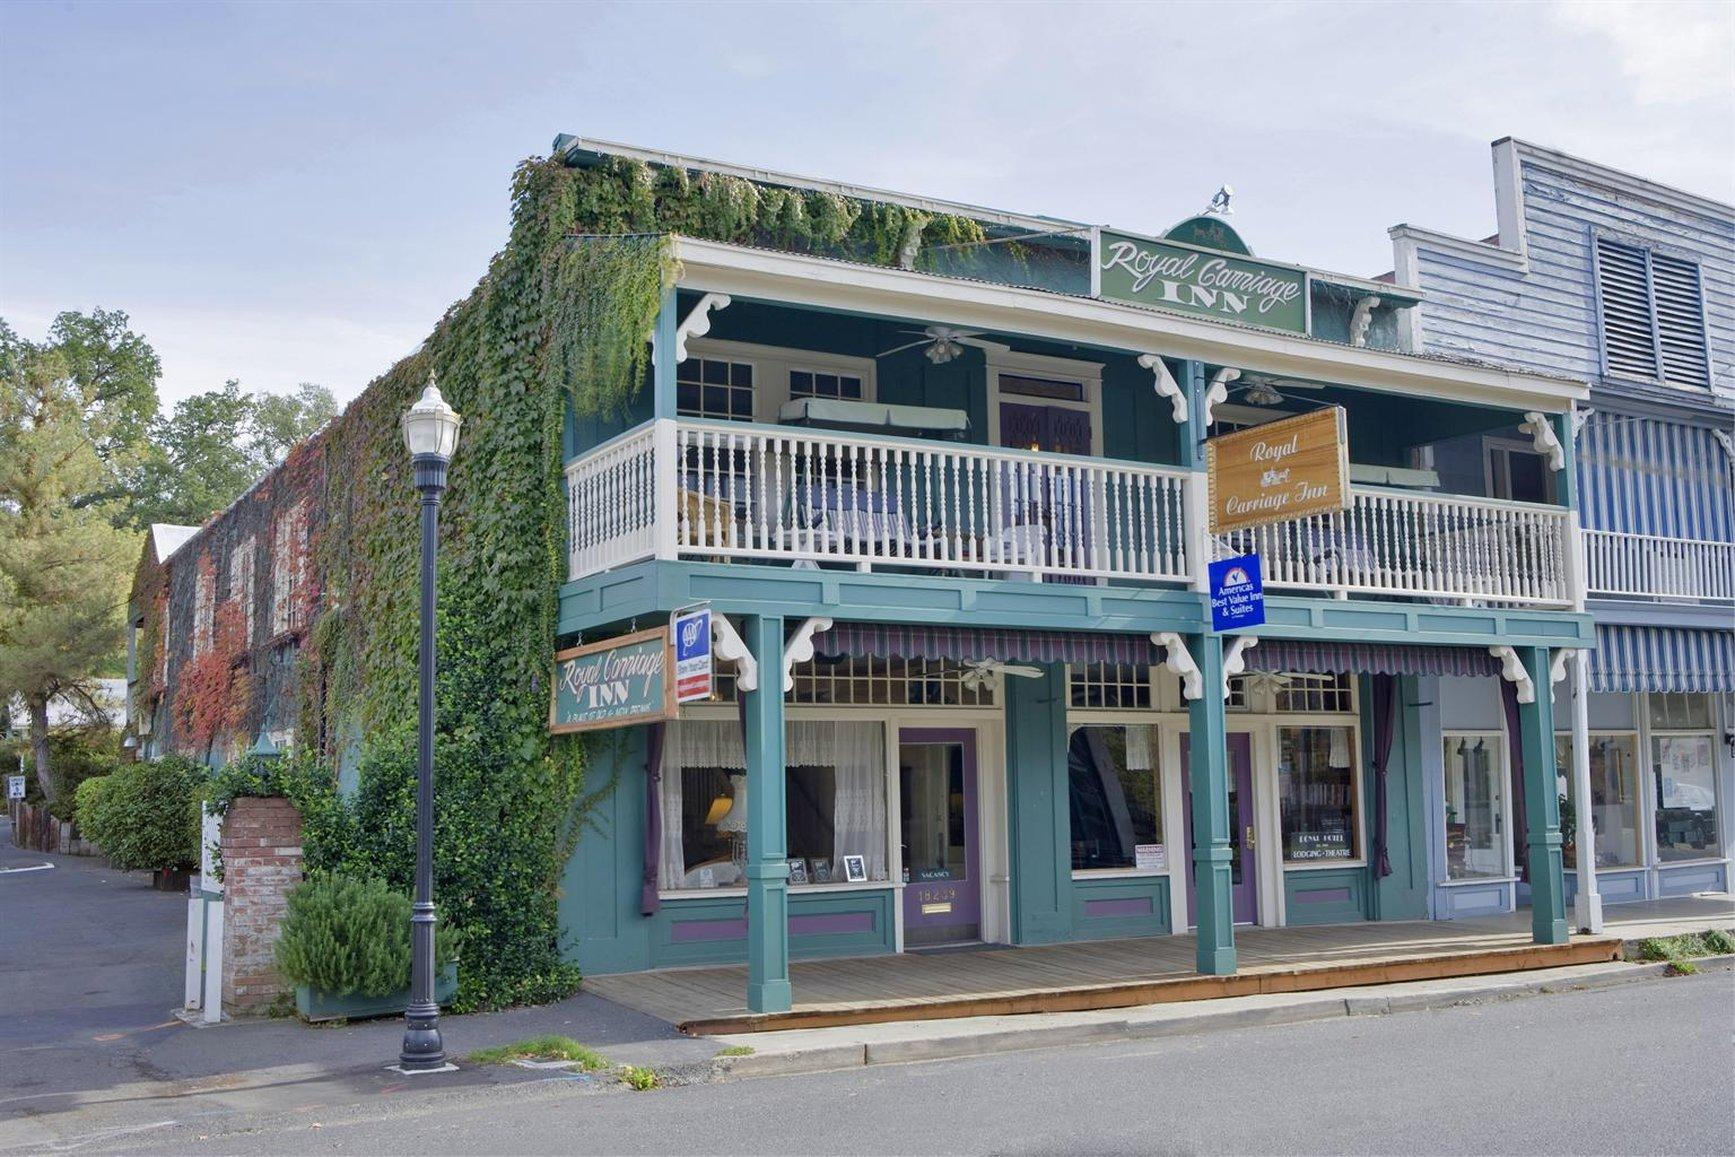 Americas Best Value Inn & Suites - Royal Carriage